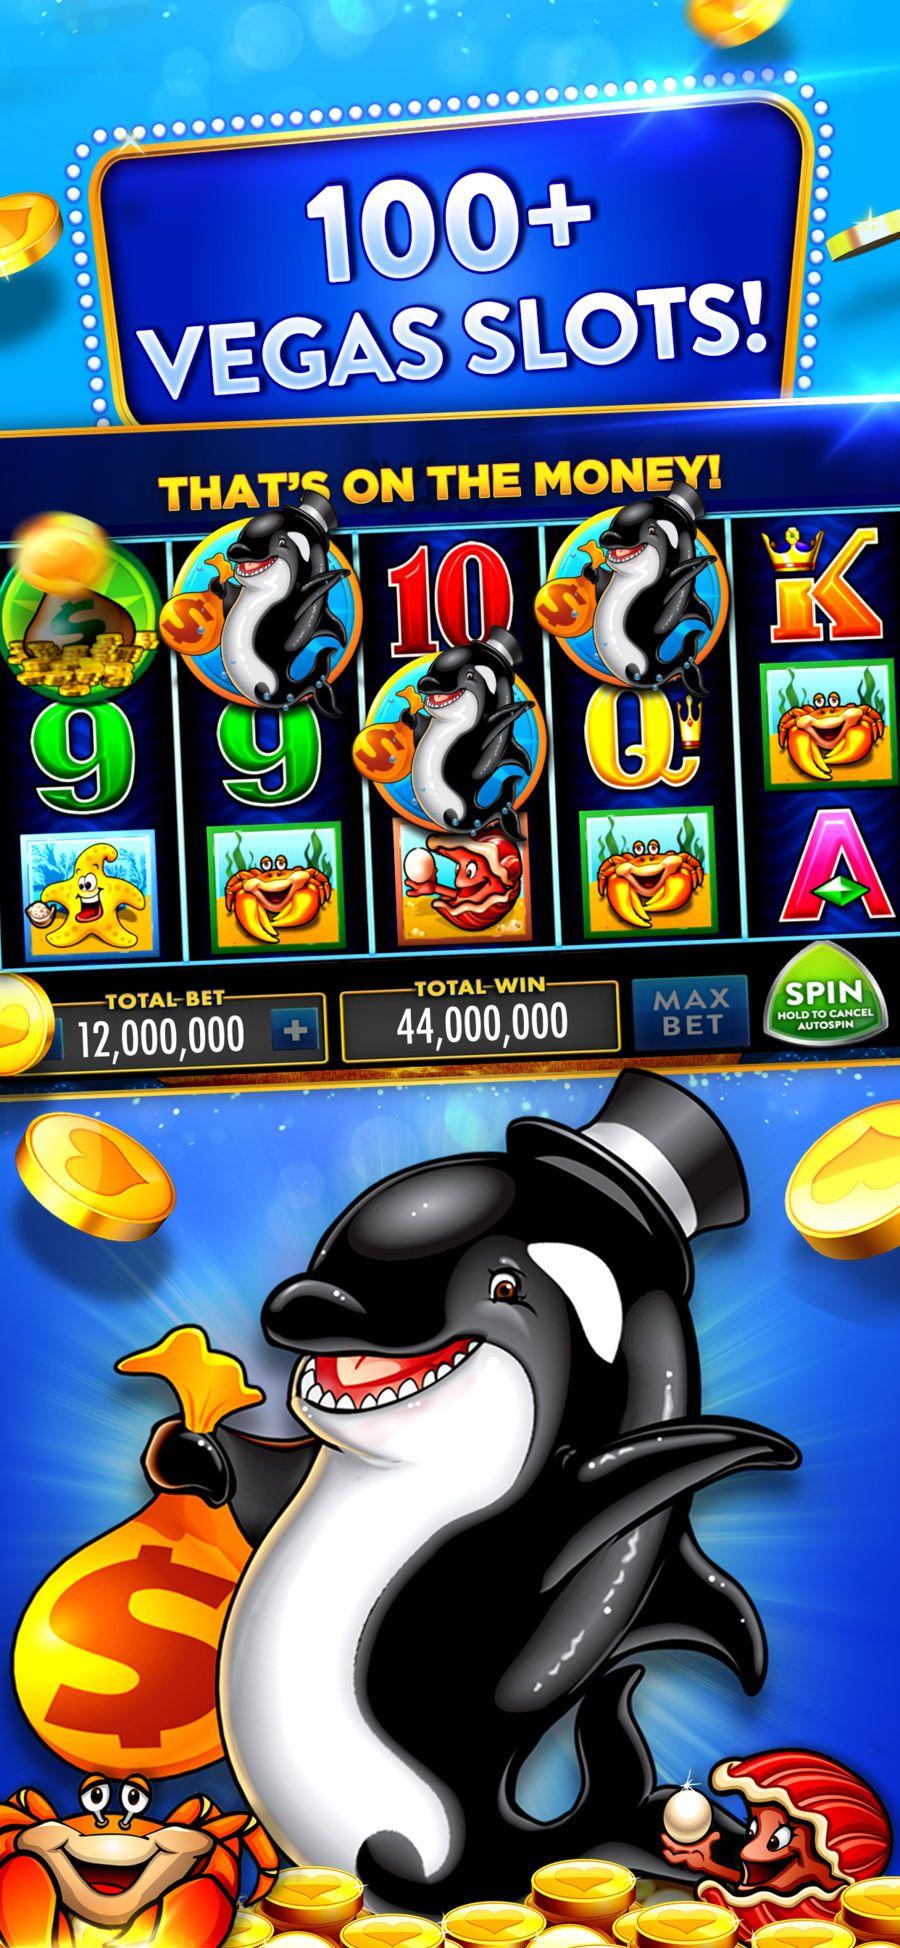 Heart of Vegas Slots Casino on the App Store Vegas